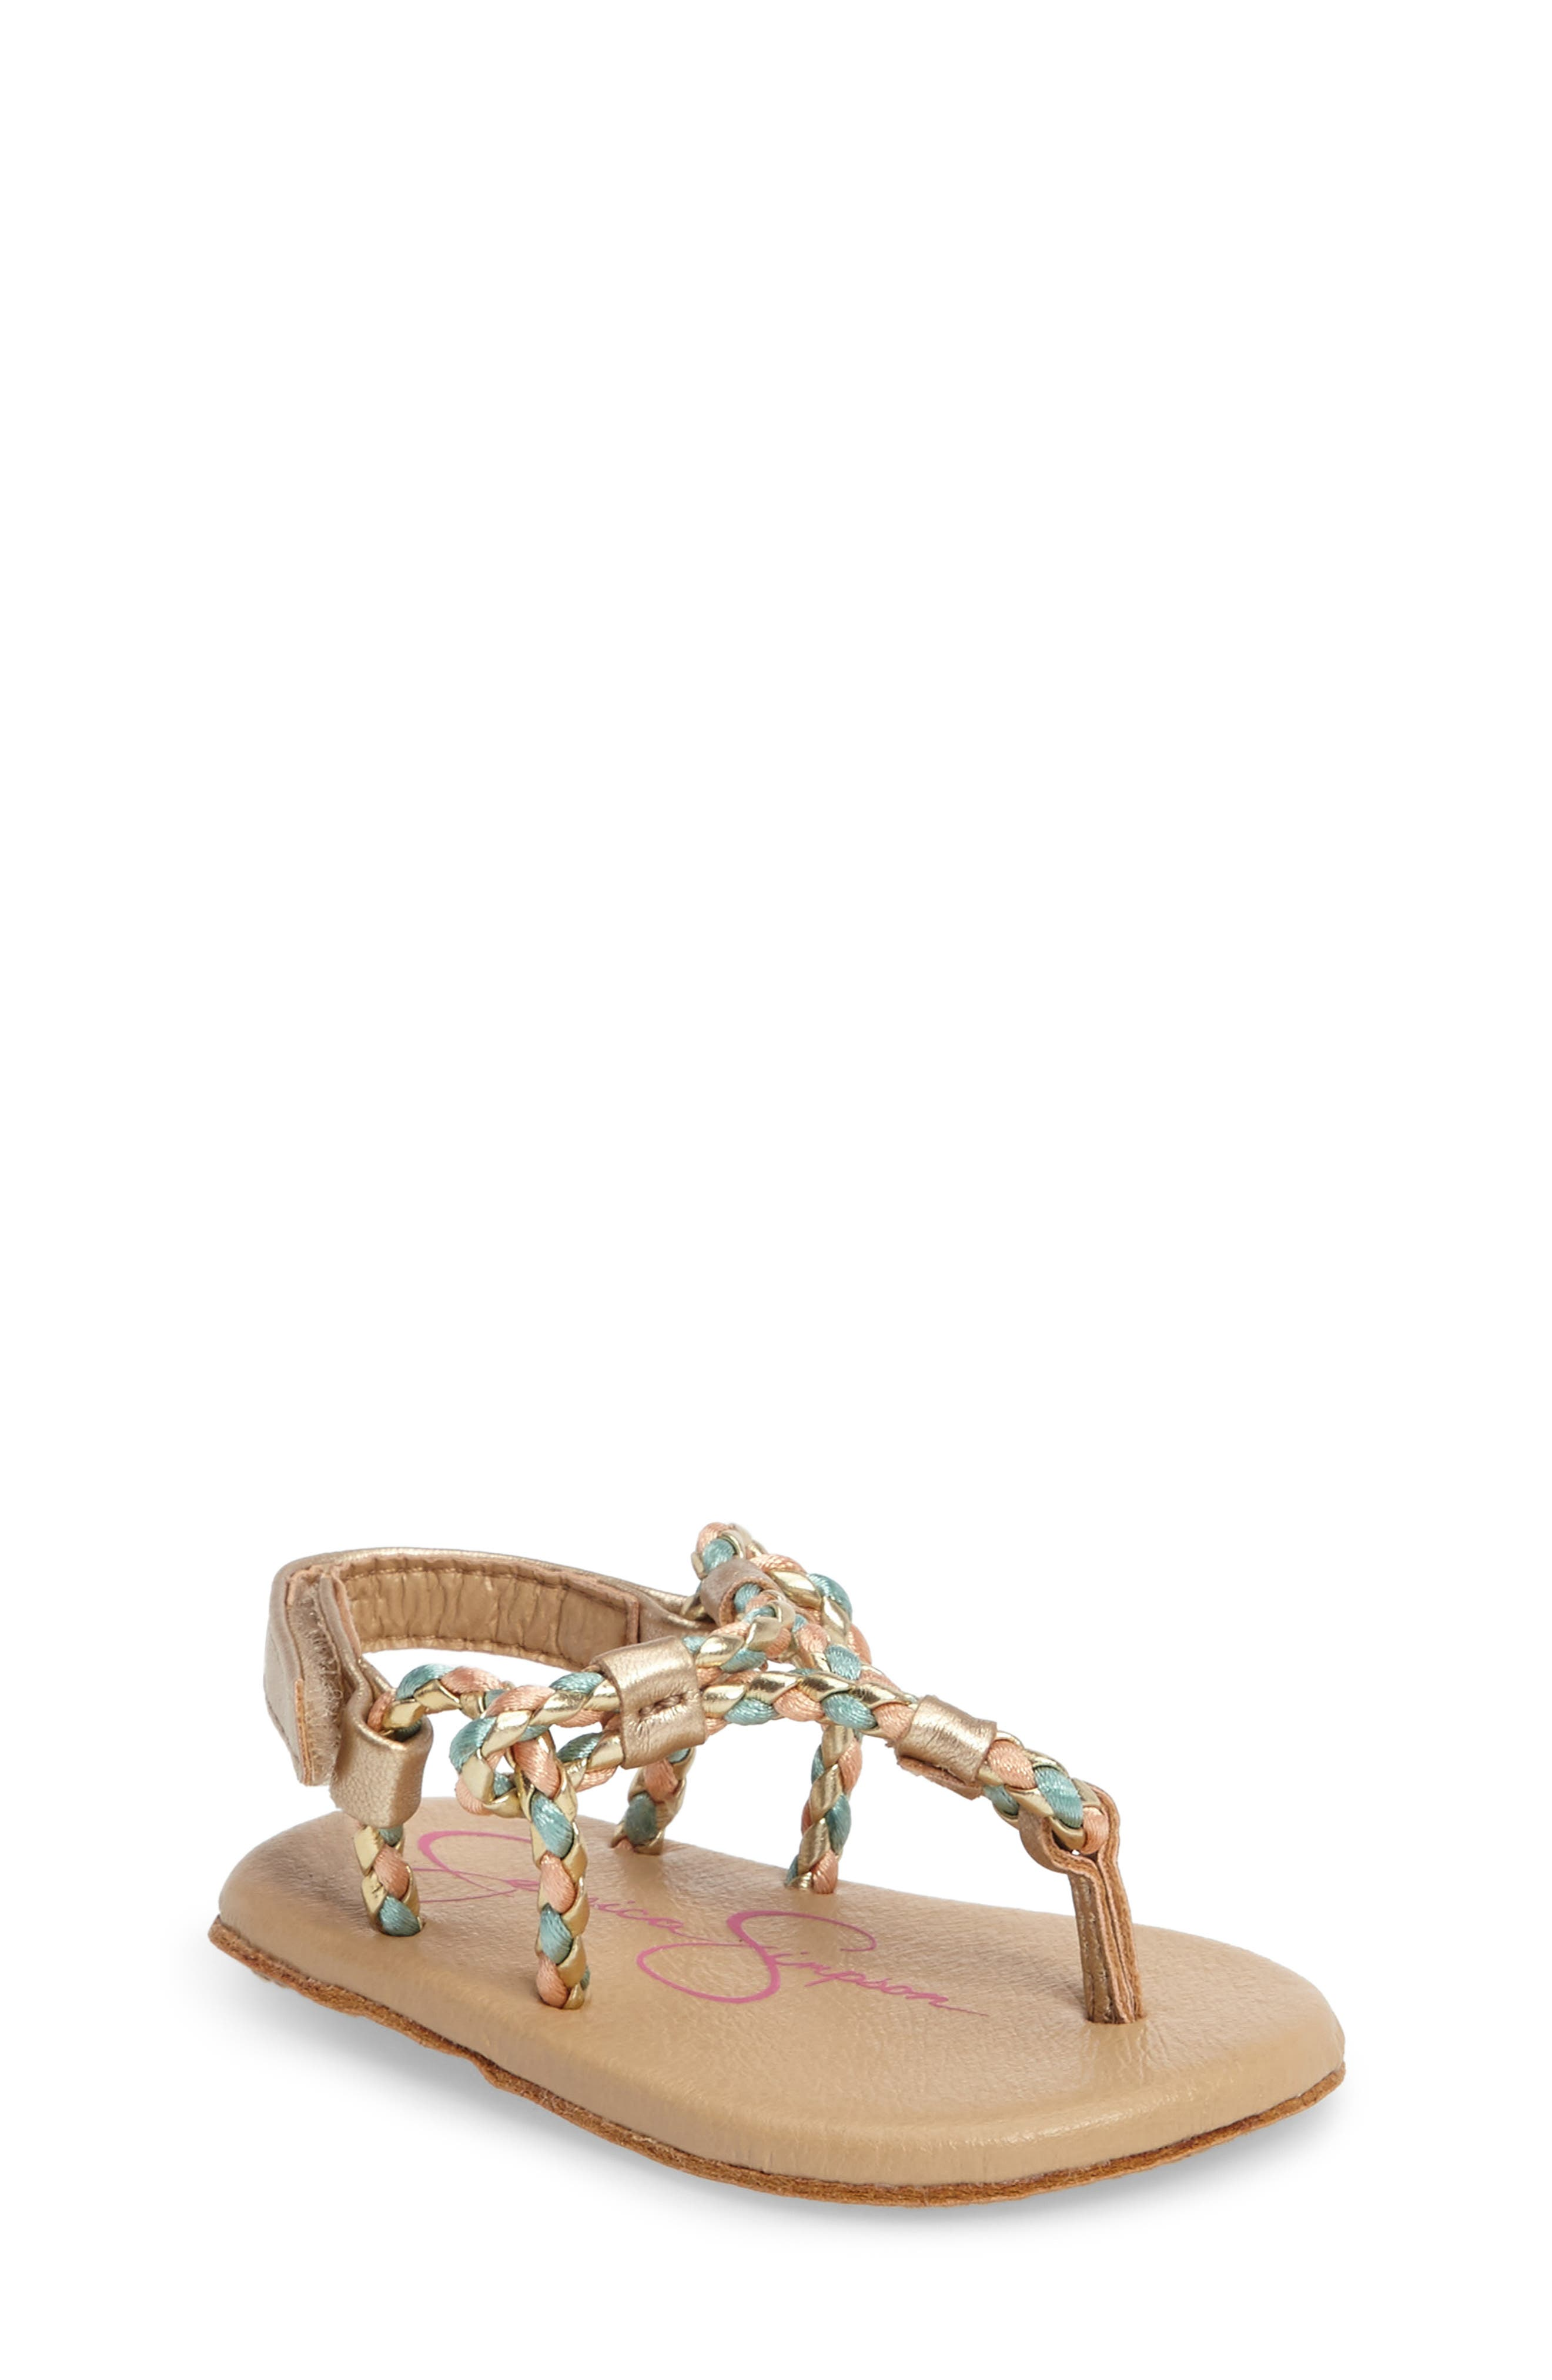 Alternate Image 1 Selected - Jessica Simpson Swizzle Thong Sandal (Baby)